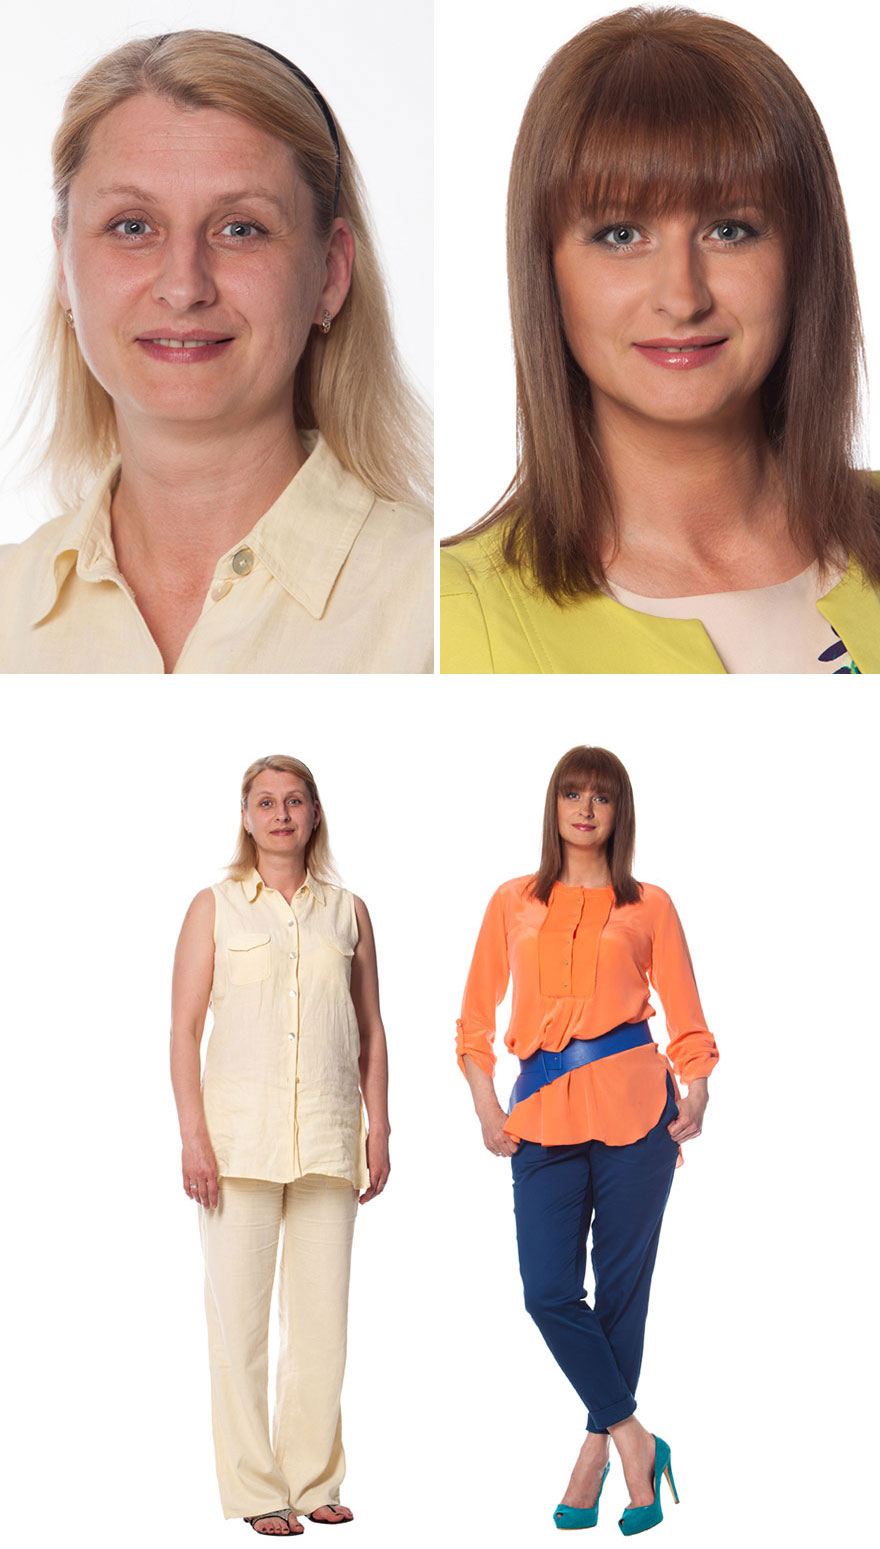 before-after-makeup-woman-style-change-konstantin-bogomolov-14